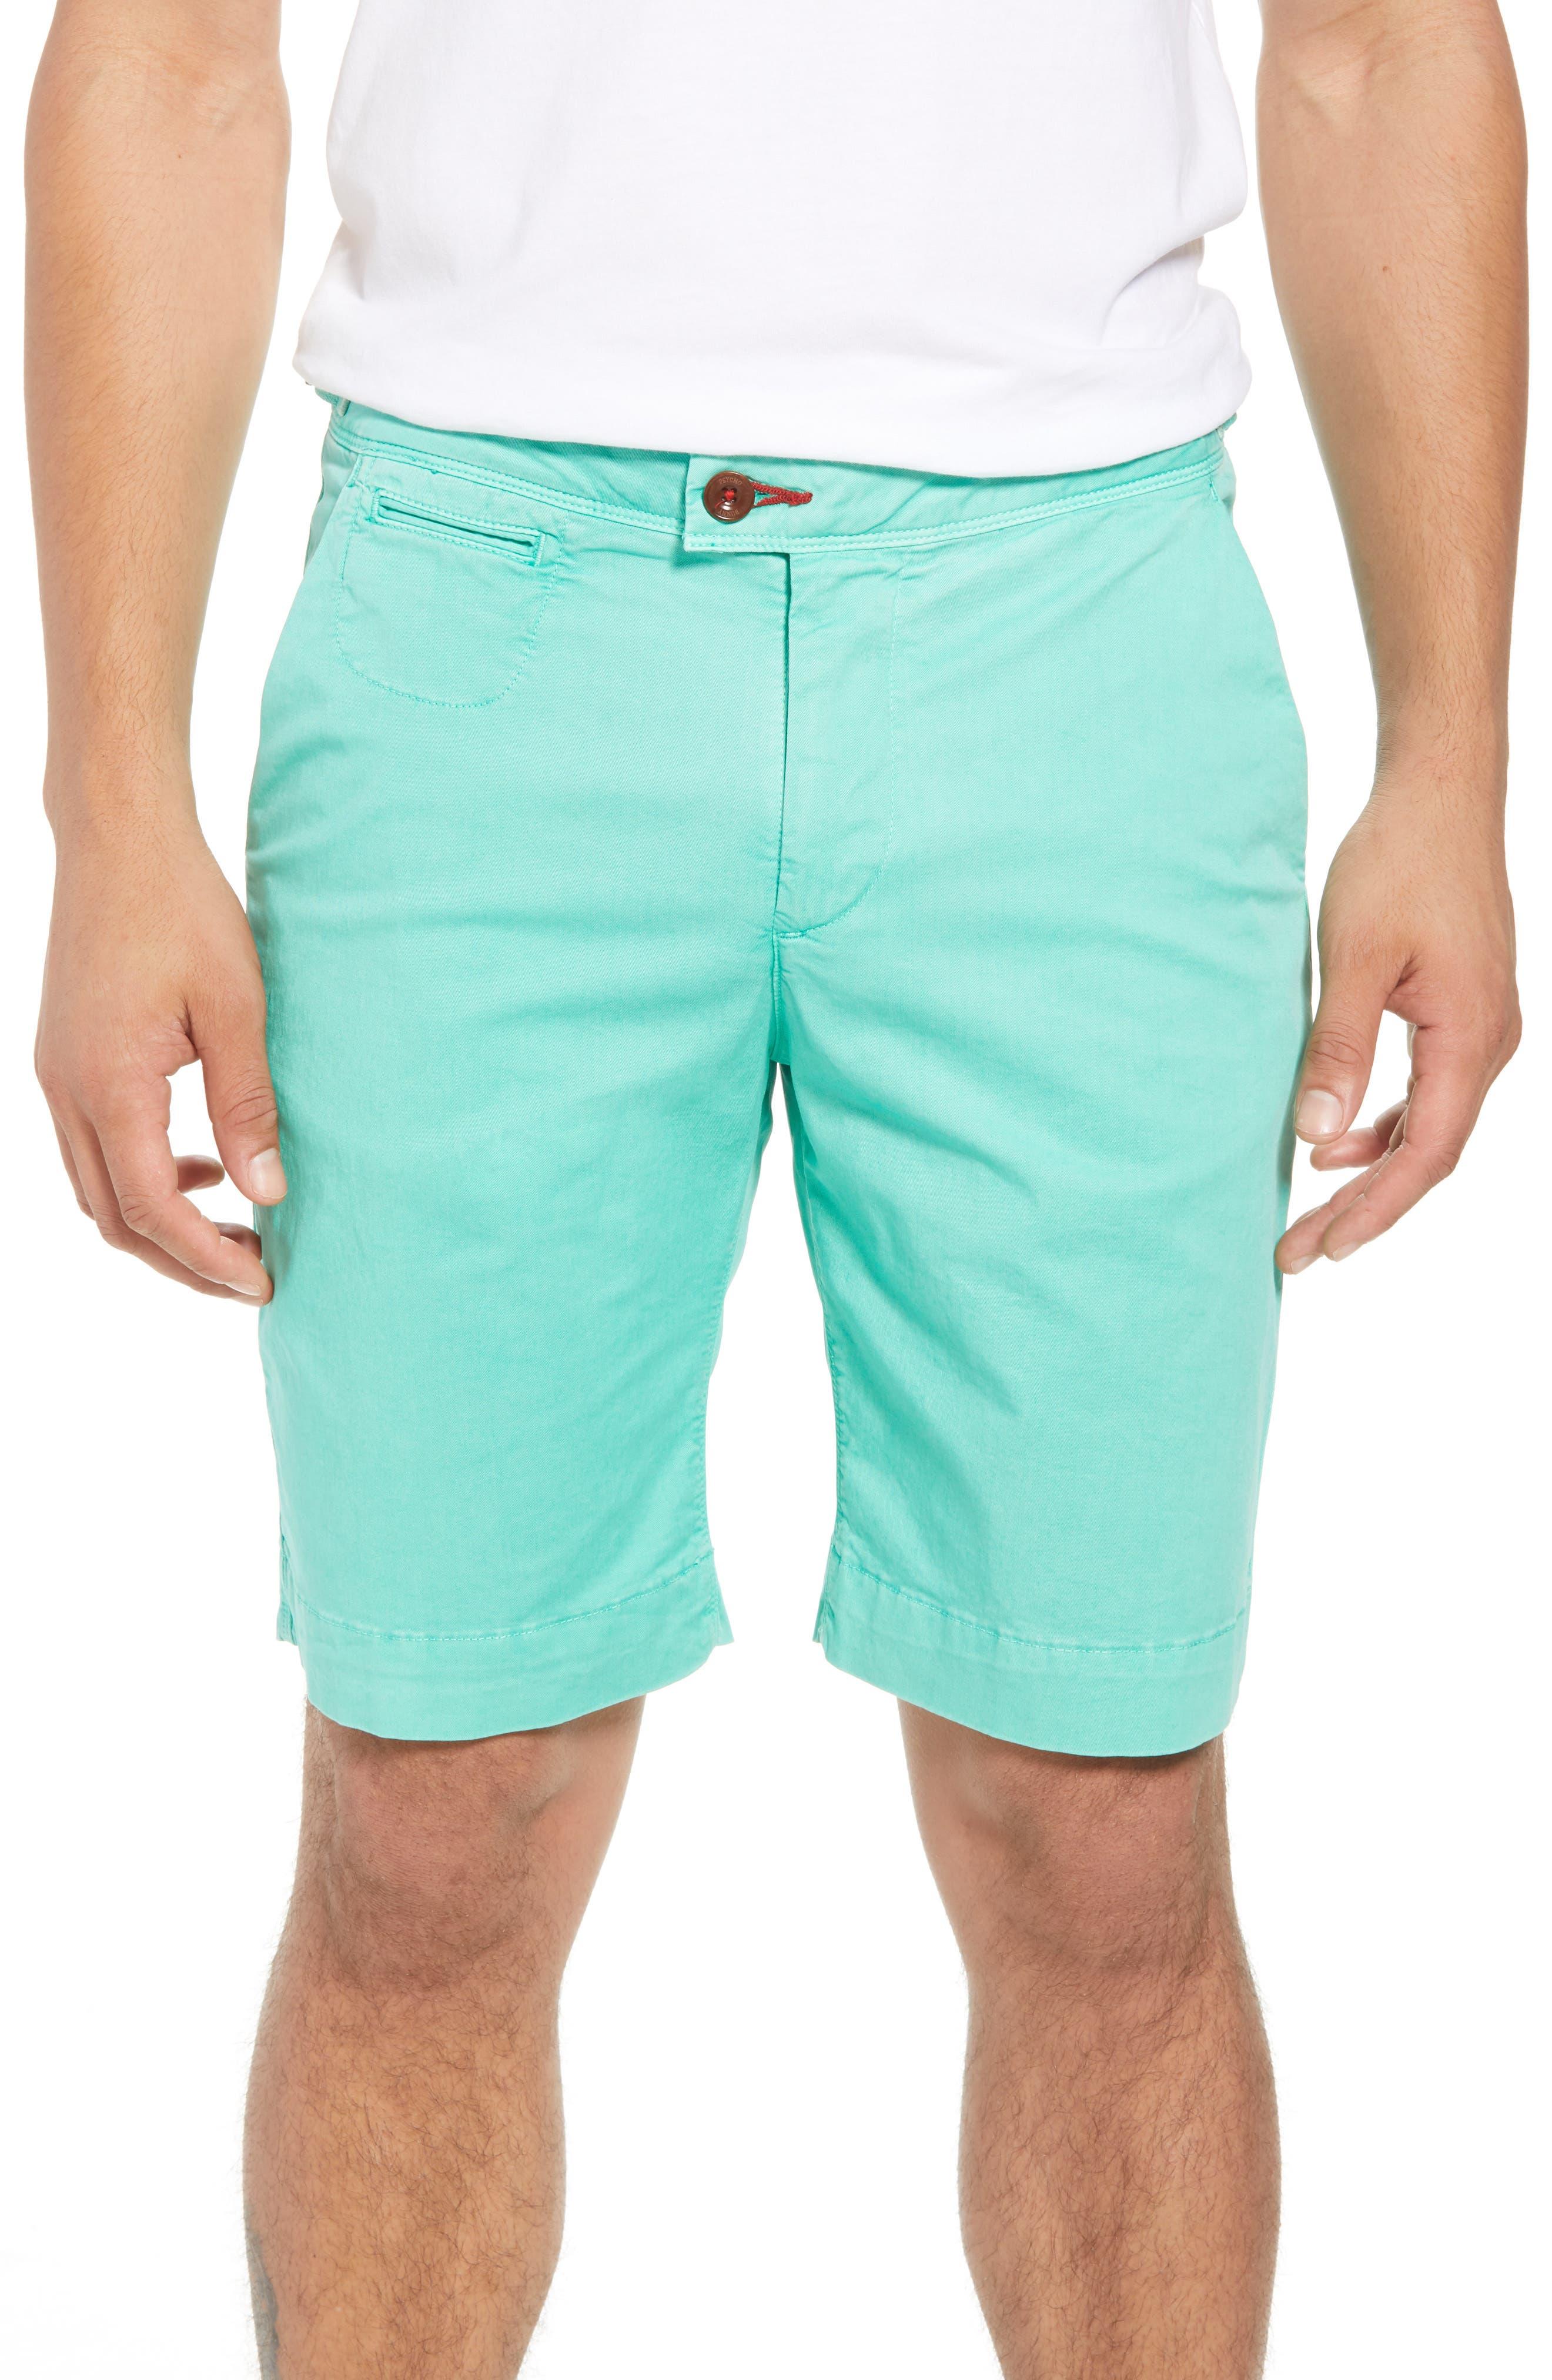 Triumph Shorts,                             Main thumbnail 10, color,